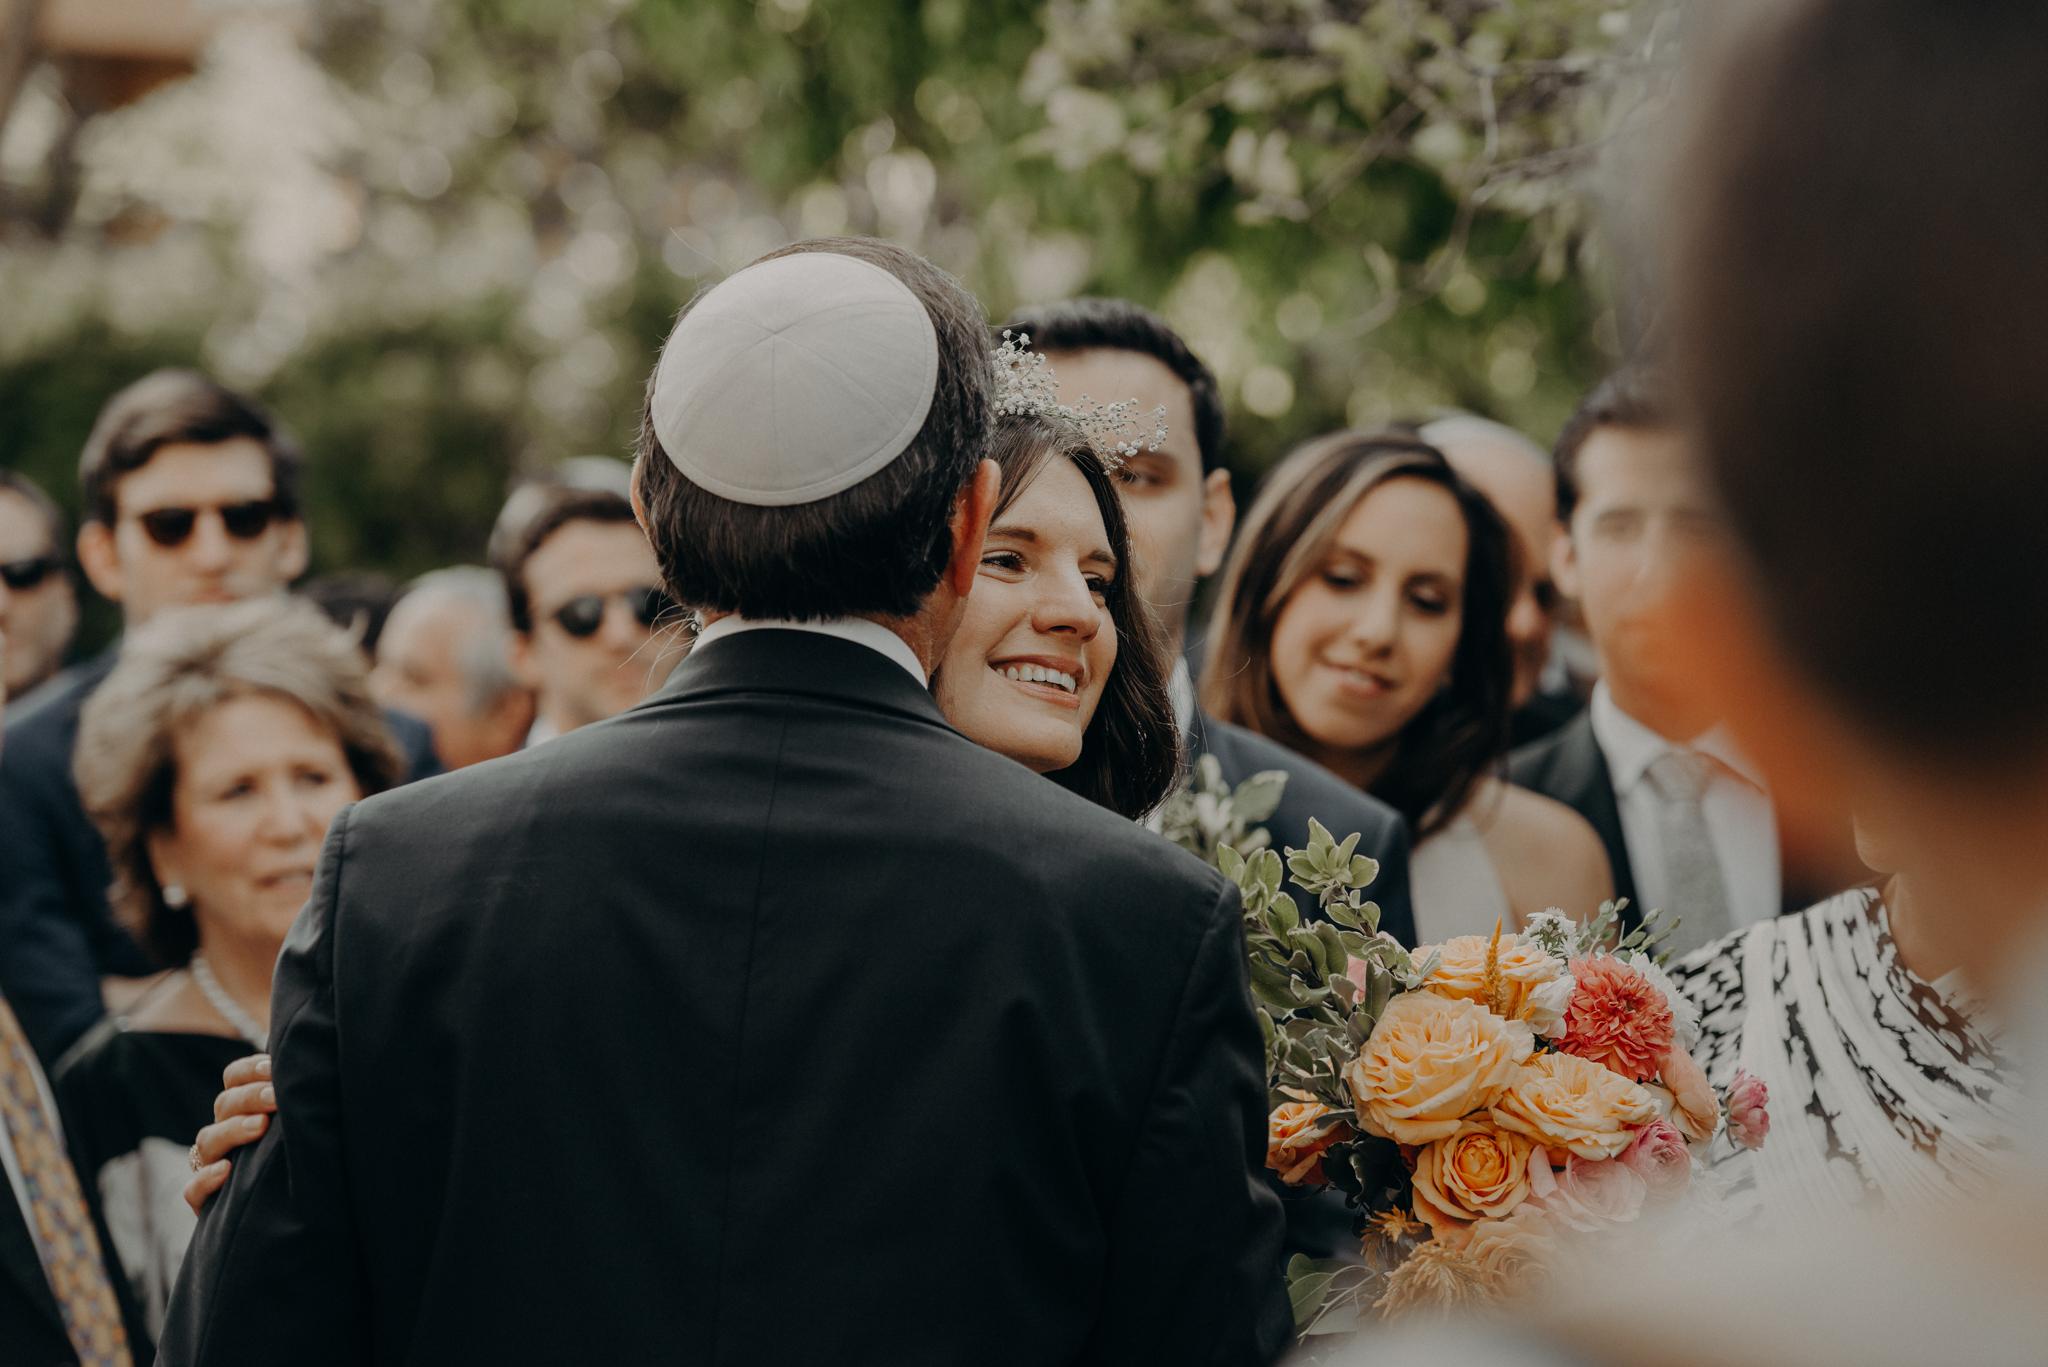 Isaiah + Taylor Photography - Private Estate Backyard Wedding - Beverly Hills - Los Angeles Wedding Photographer - 70.jpg